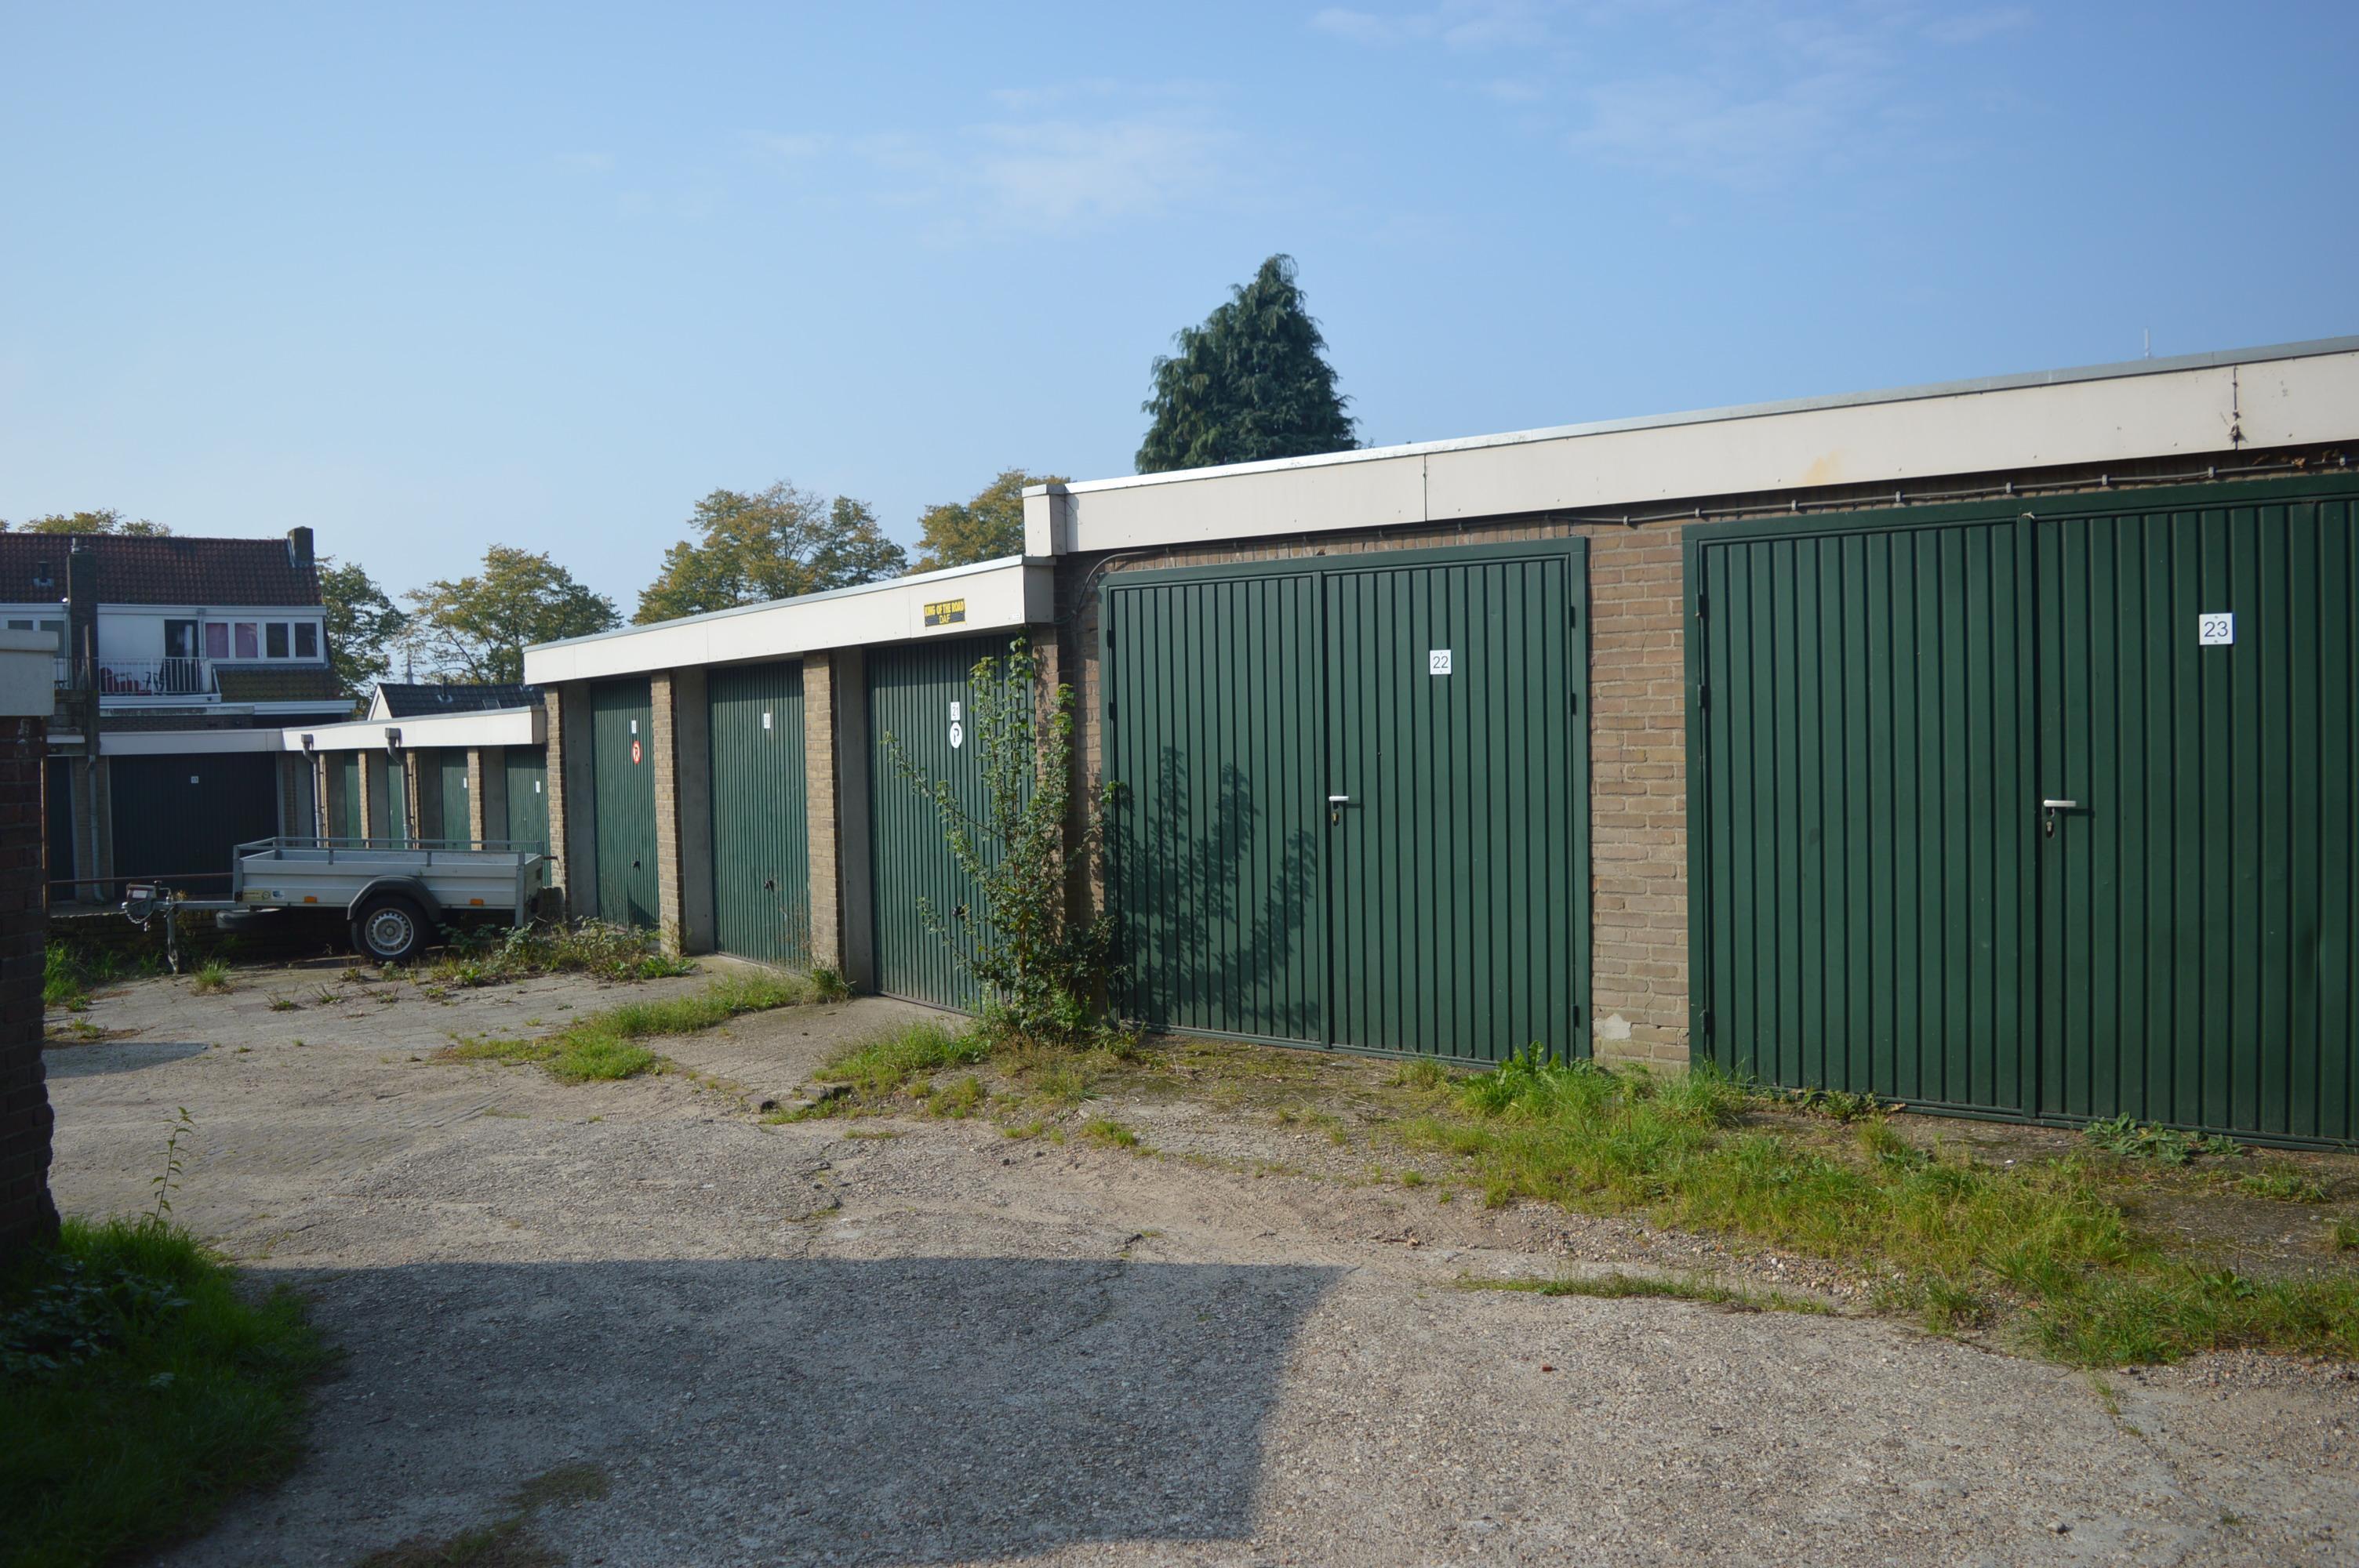 Garage Huren Arnhem : Garagebox garagebox van wageningenstraat te huur in arnhem nederwoon